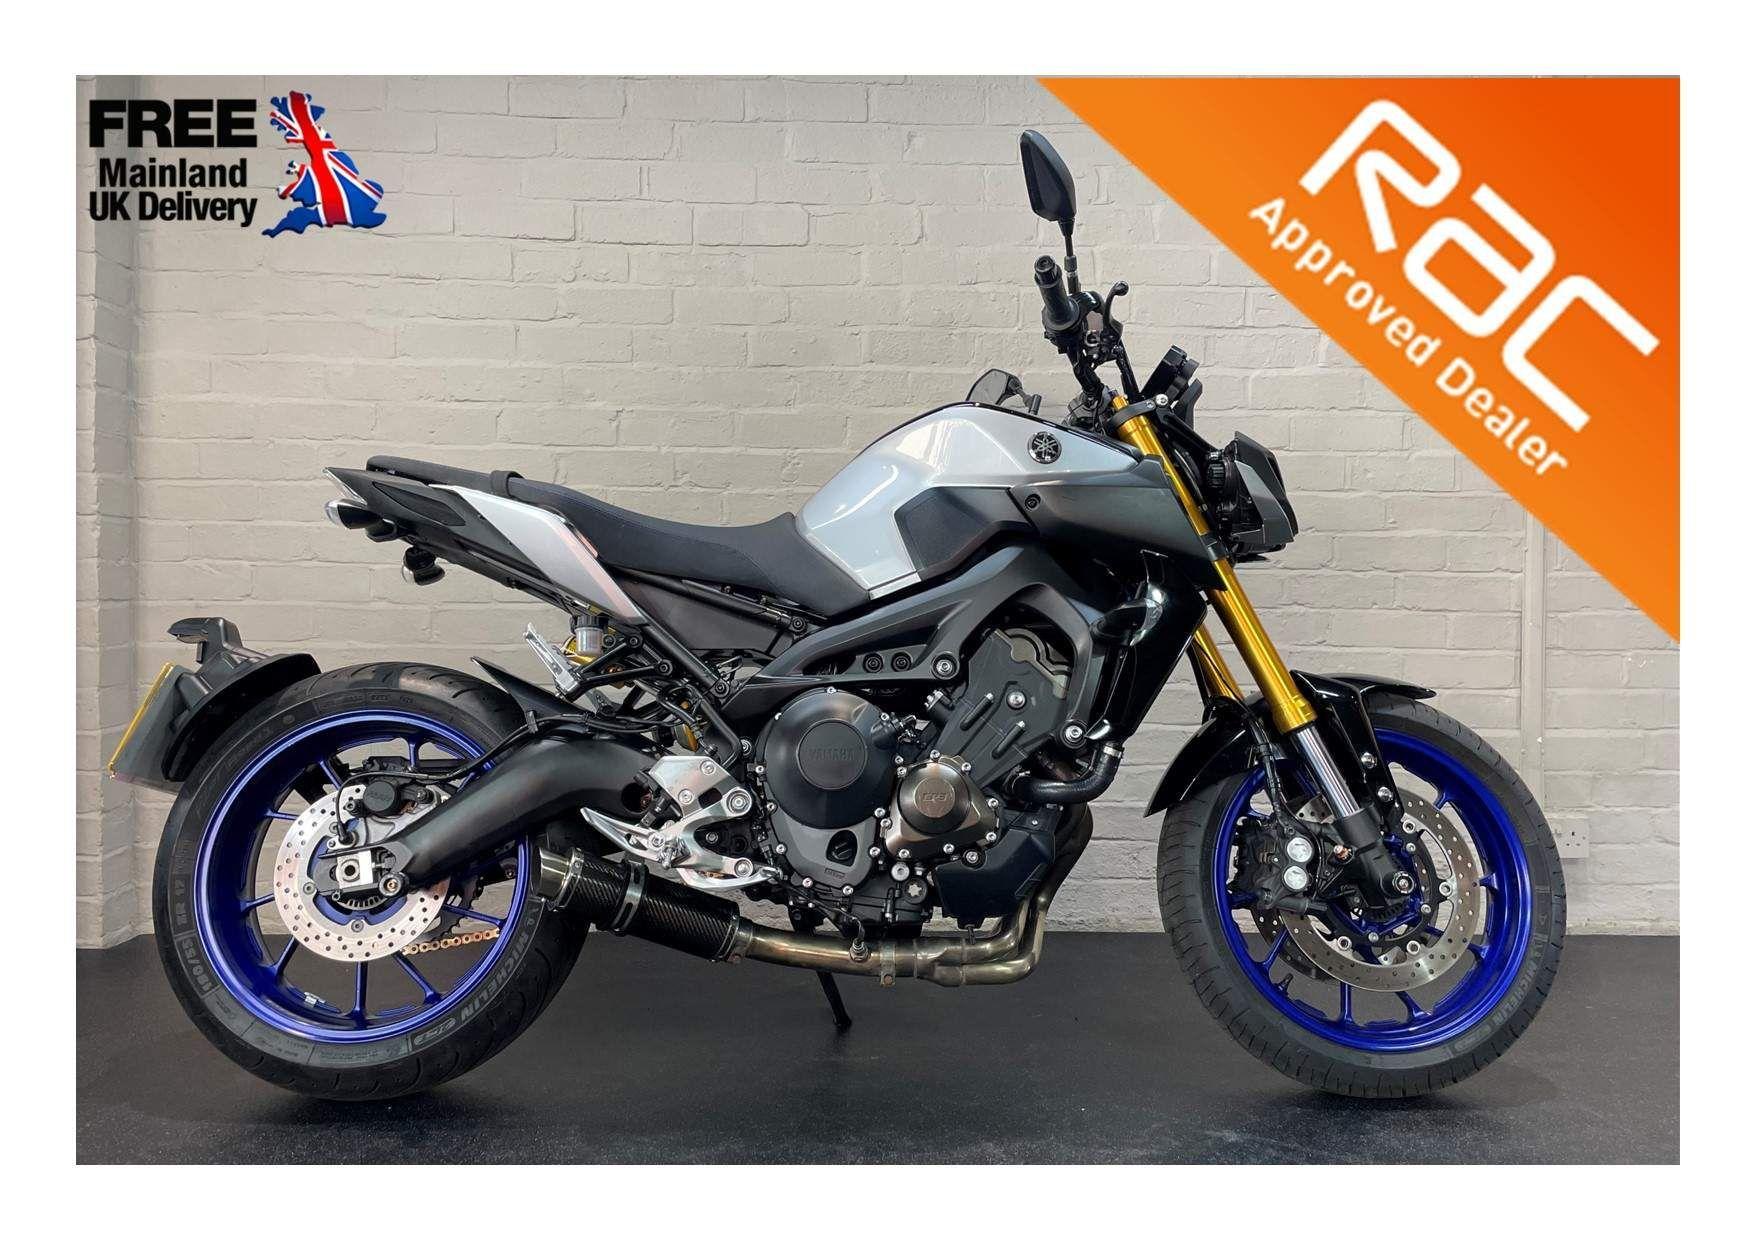 2019 Yamaha MT-09 SP 850 09 SP ABS